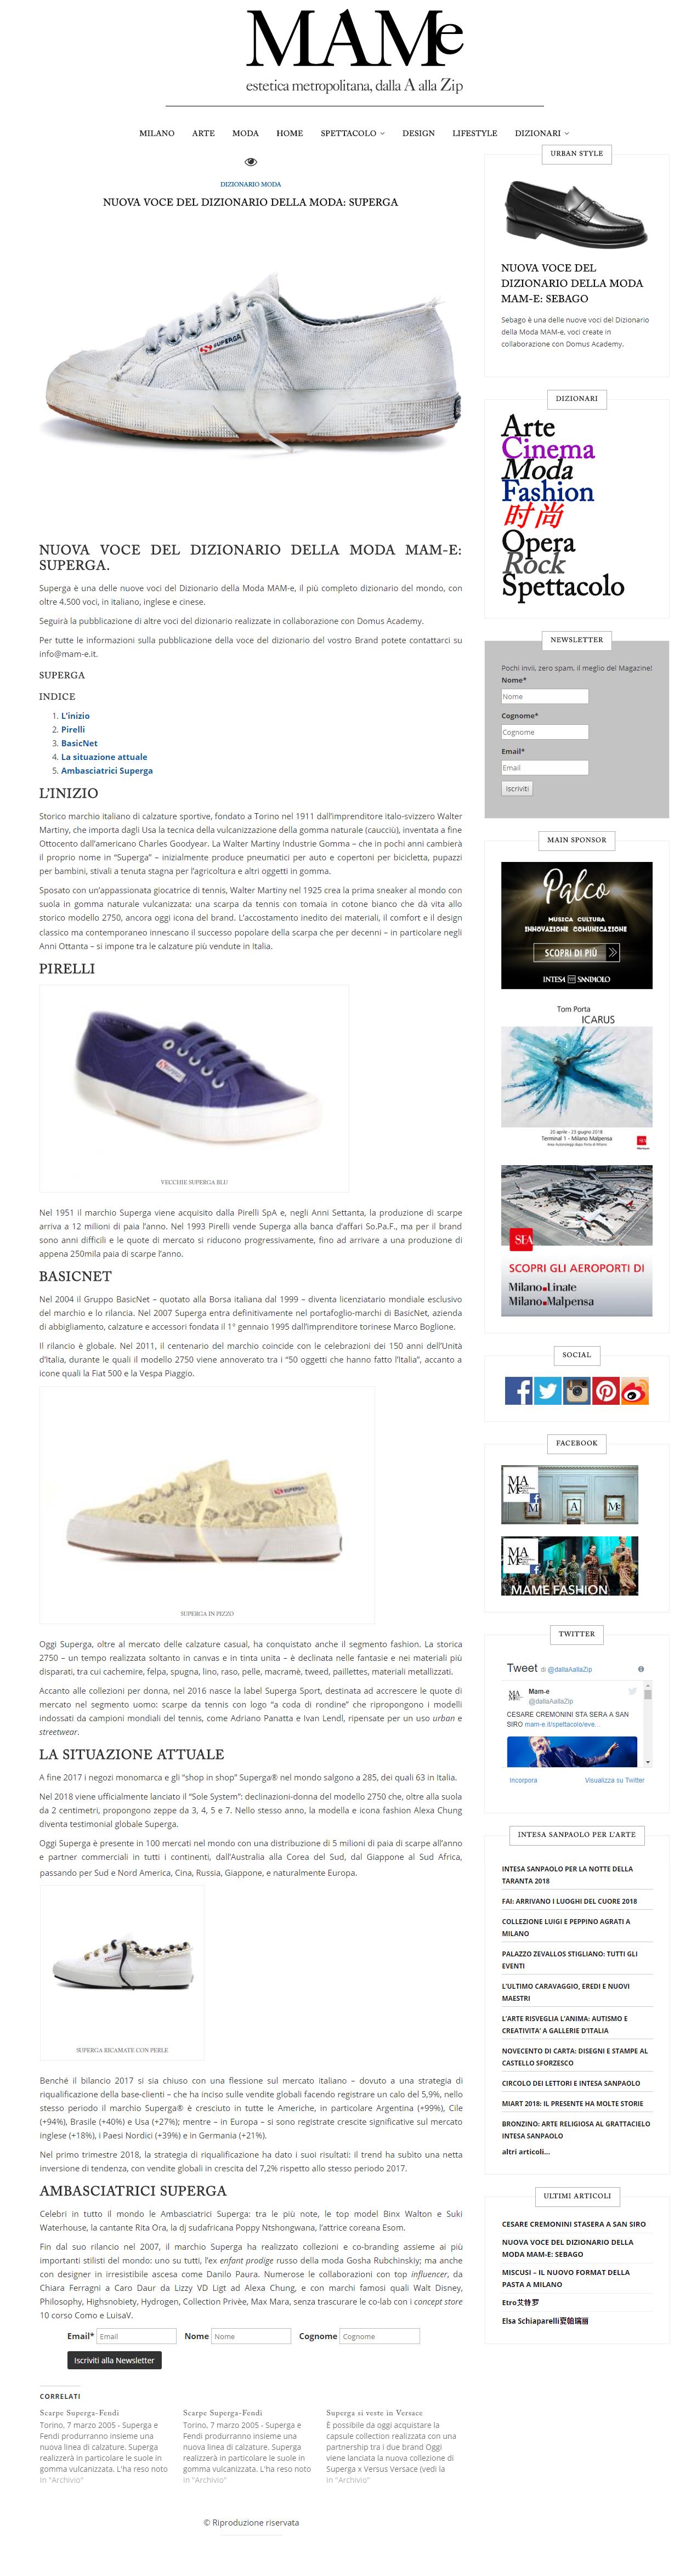 Shop Kwots Donna Shop Sneakers Kwots Donna Online Sneakers dtsQxBhrC